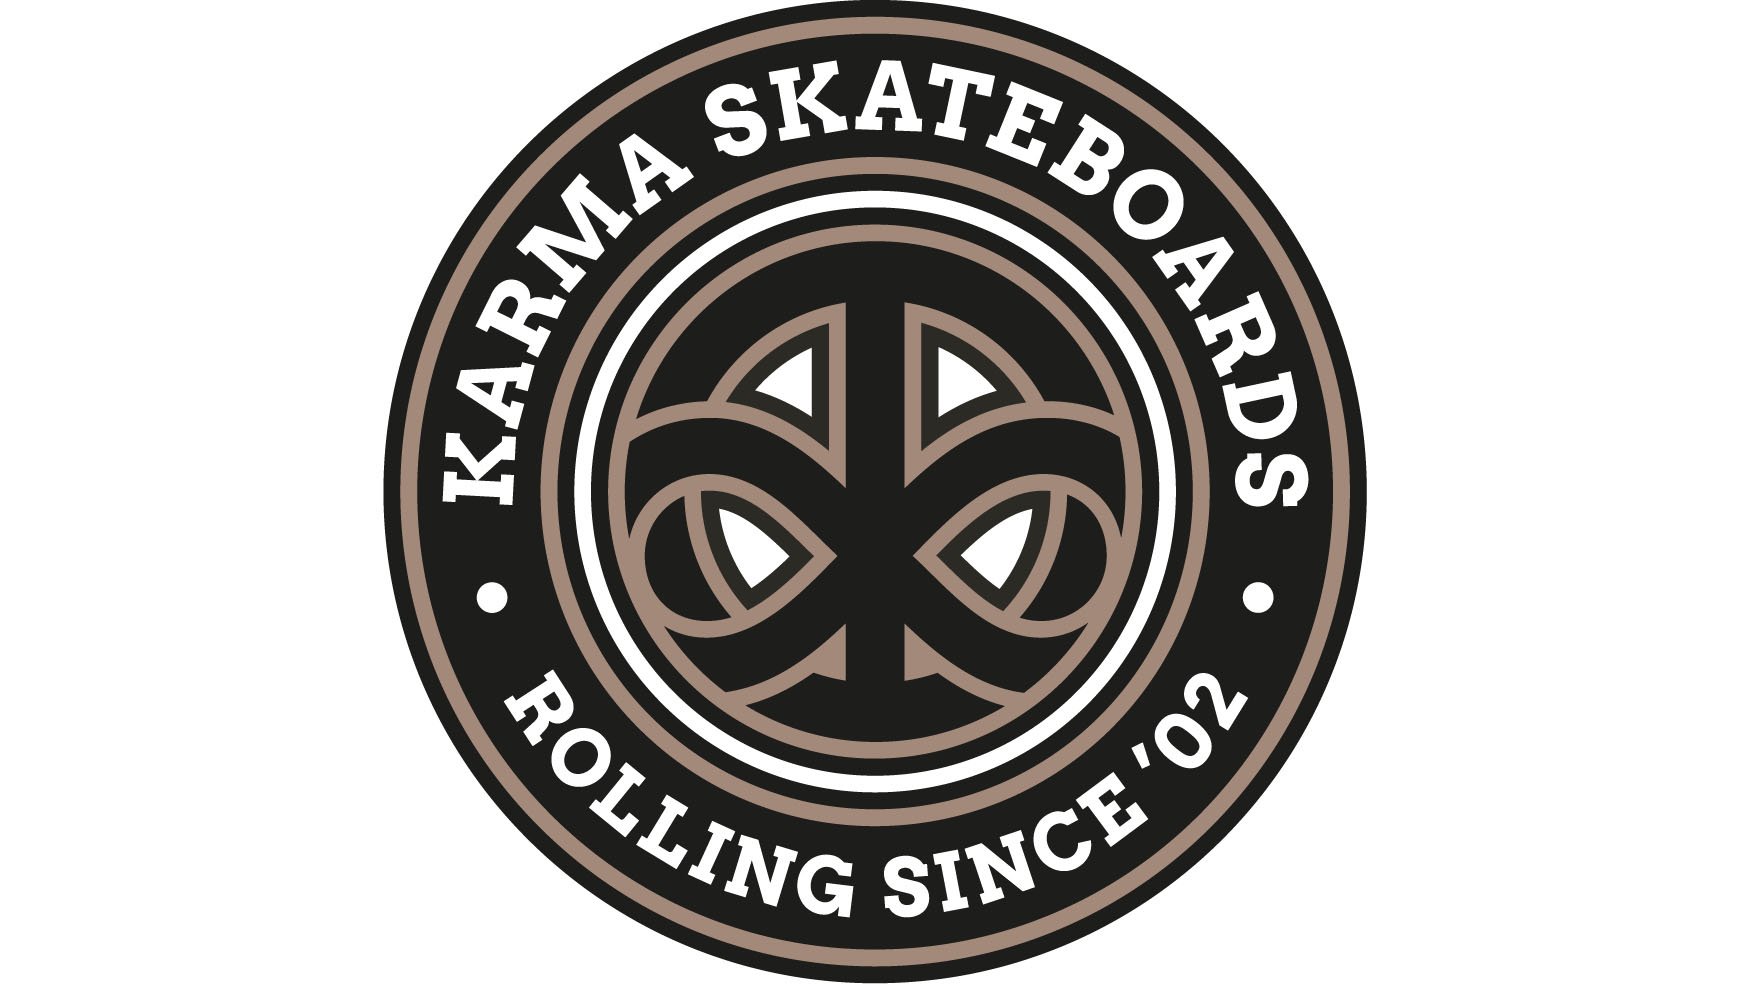 Karma Skateboards logo